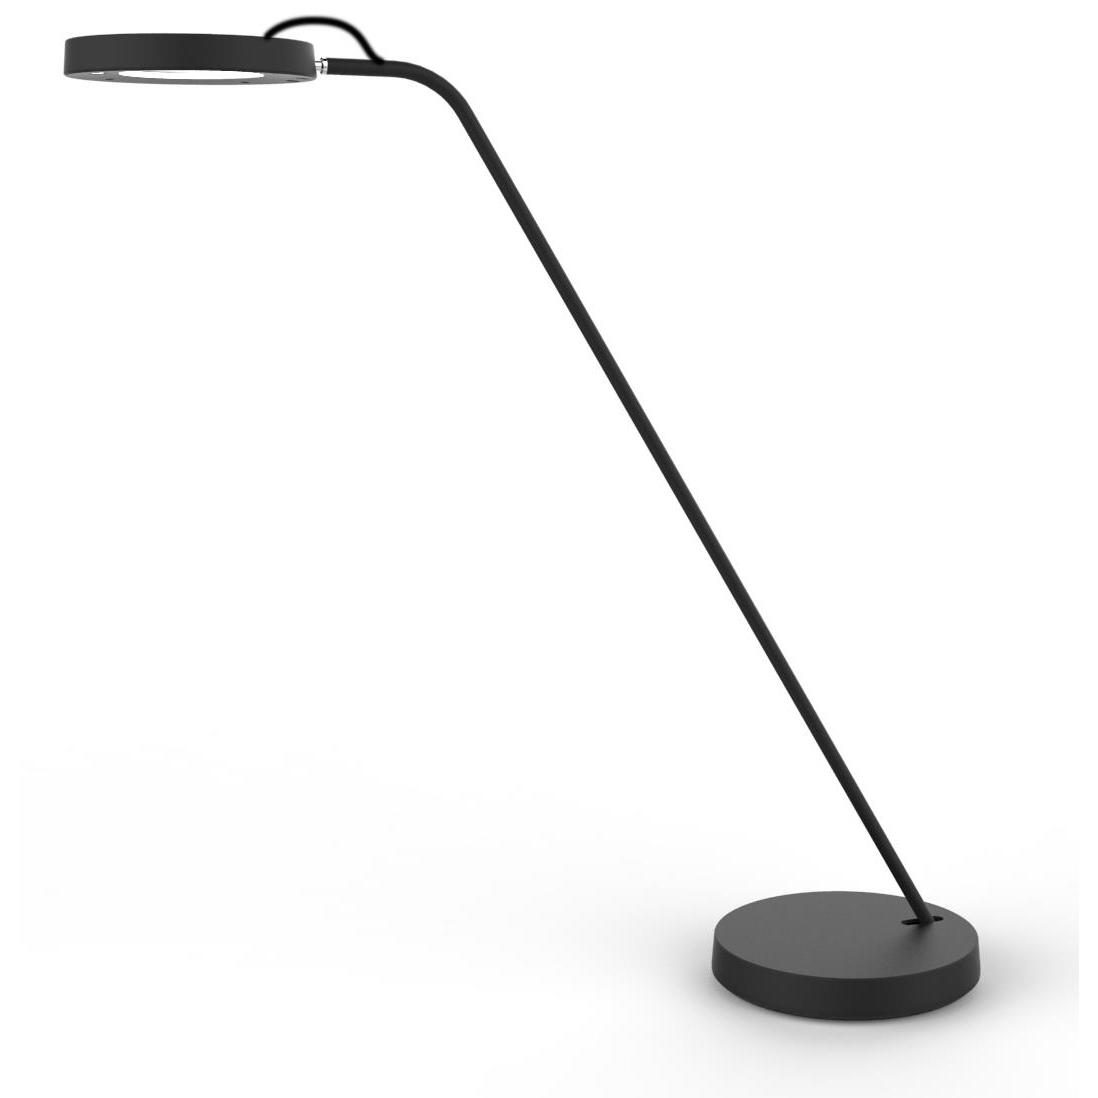 Unilux i-LIGHT LED Desk Lamp Adjustable Light 5W Height 510mm Base Diameter 190mm Black Ref 400101416